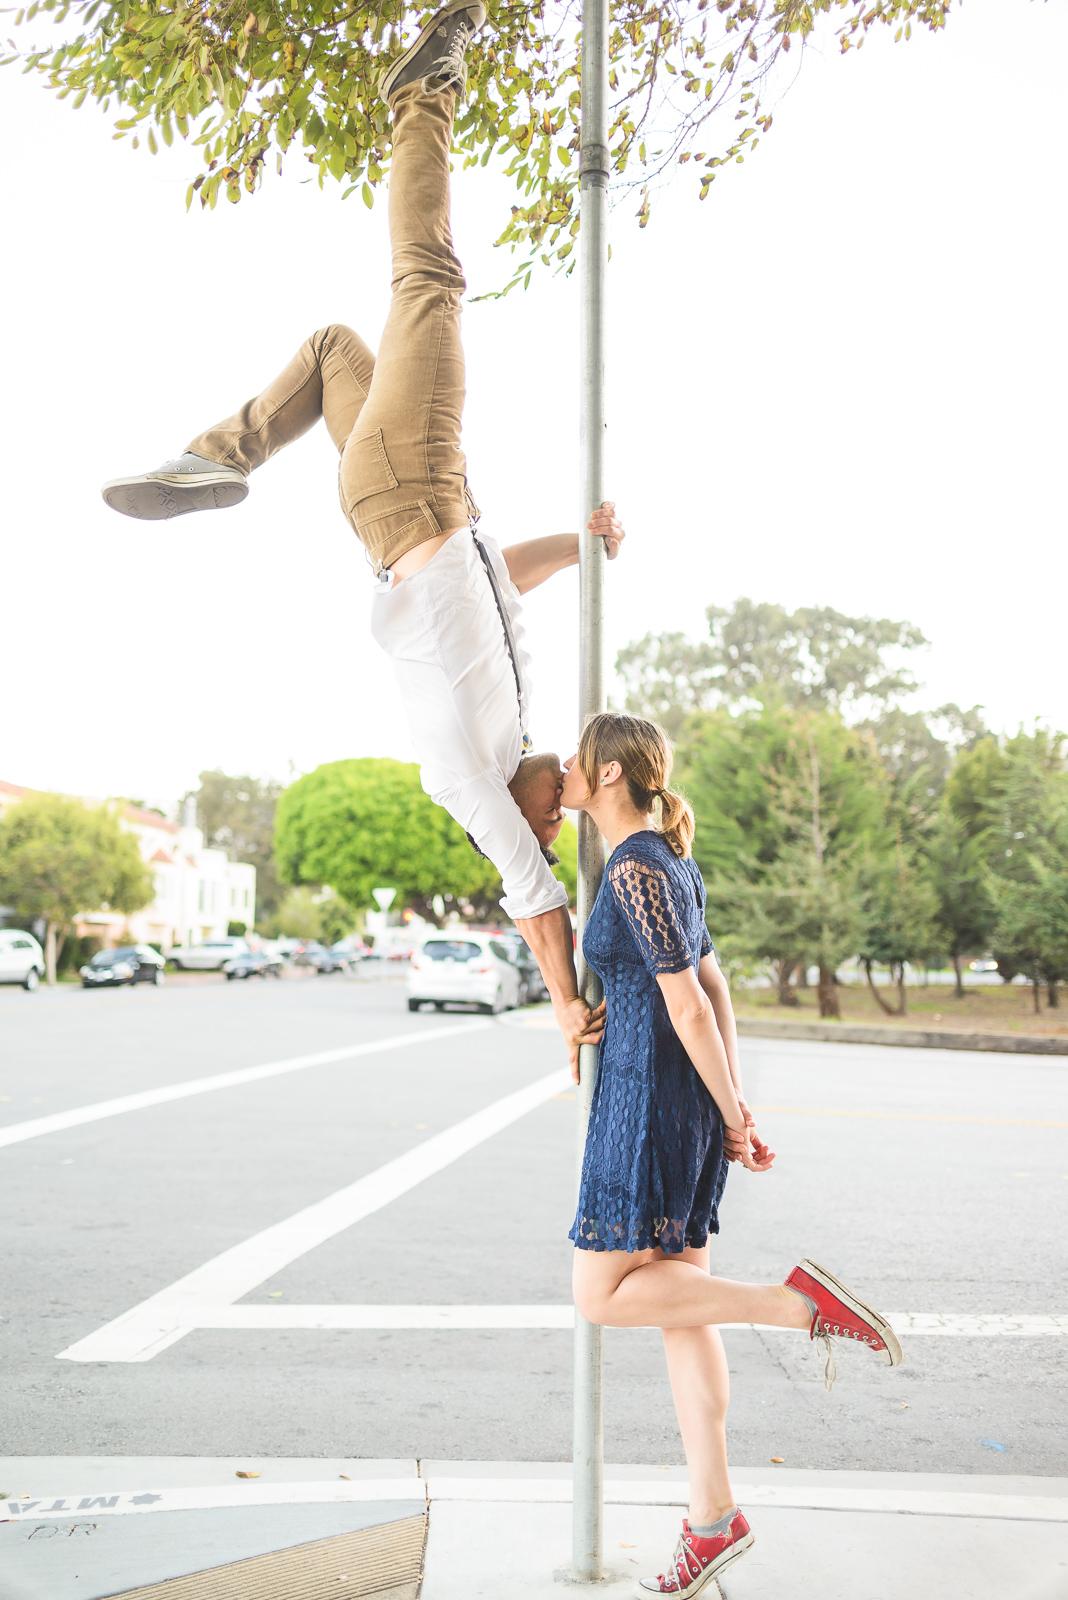 Acrobatic Kissing Photo